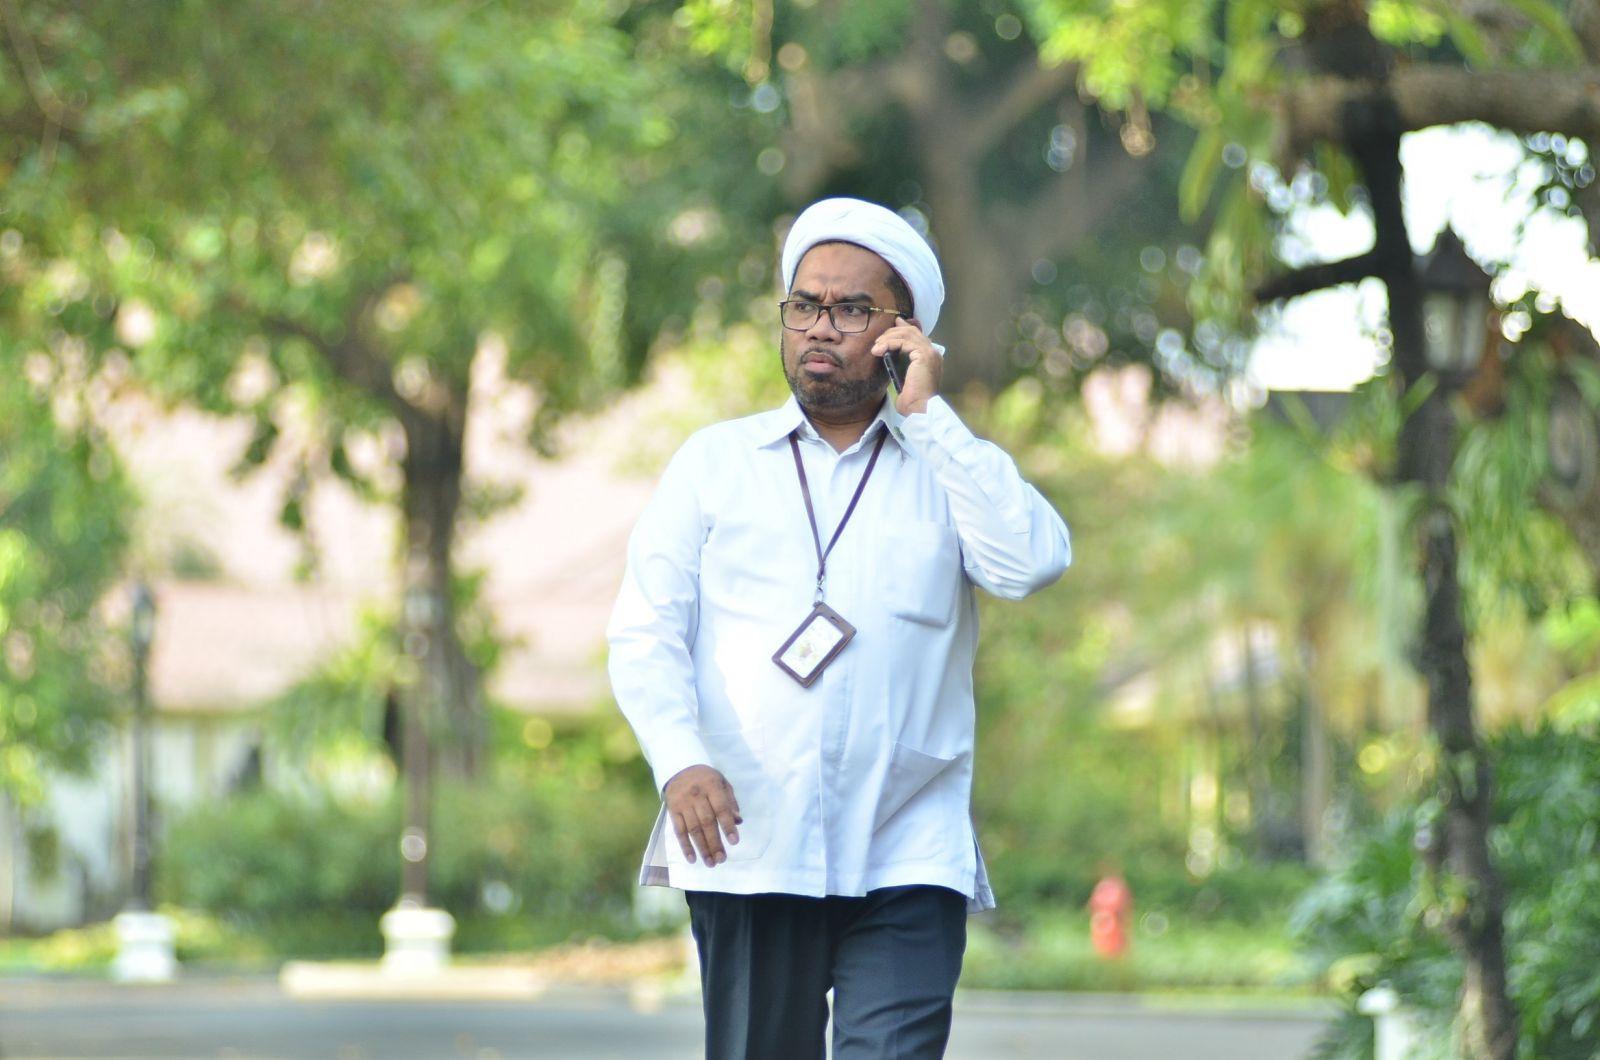 Eks Demokrat Bongkar Alasan Ali Ngabalin Sindir Busyro Muqodas